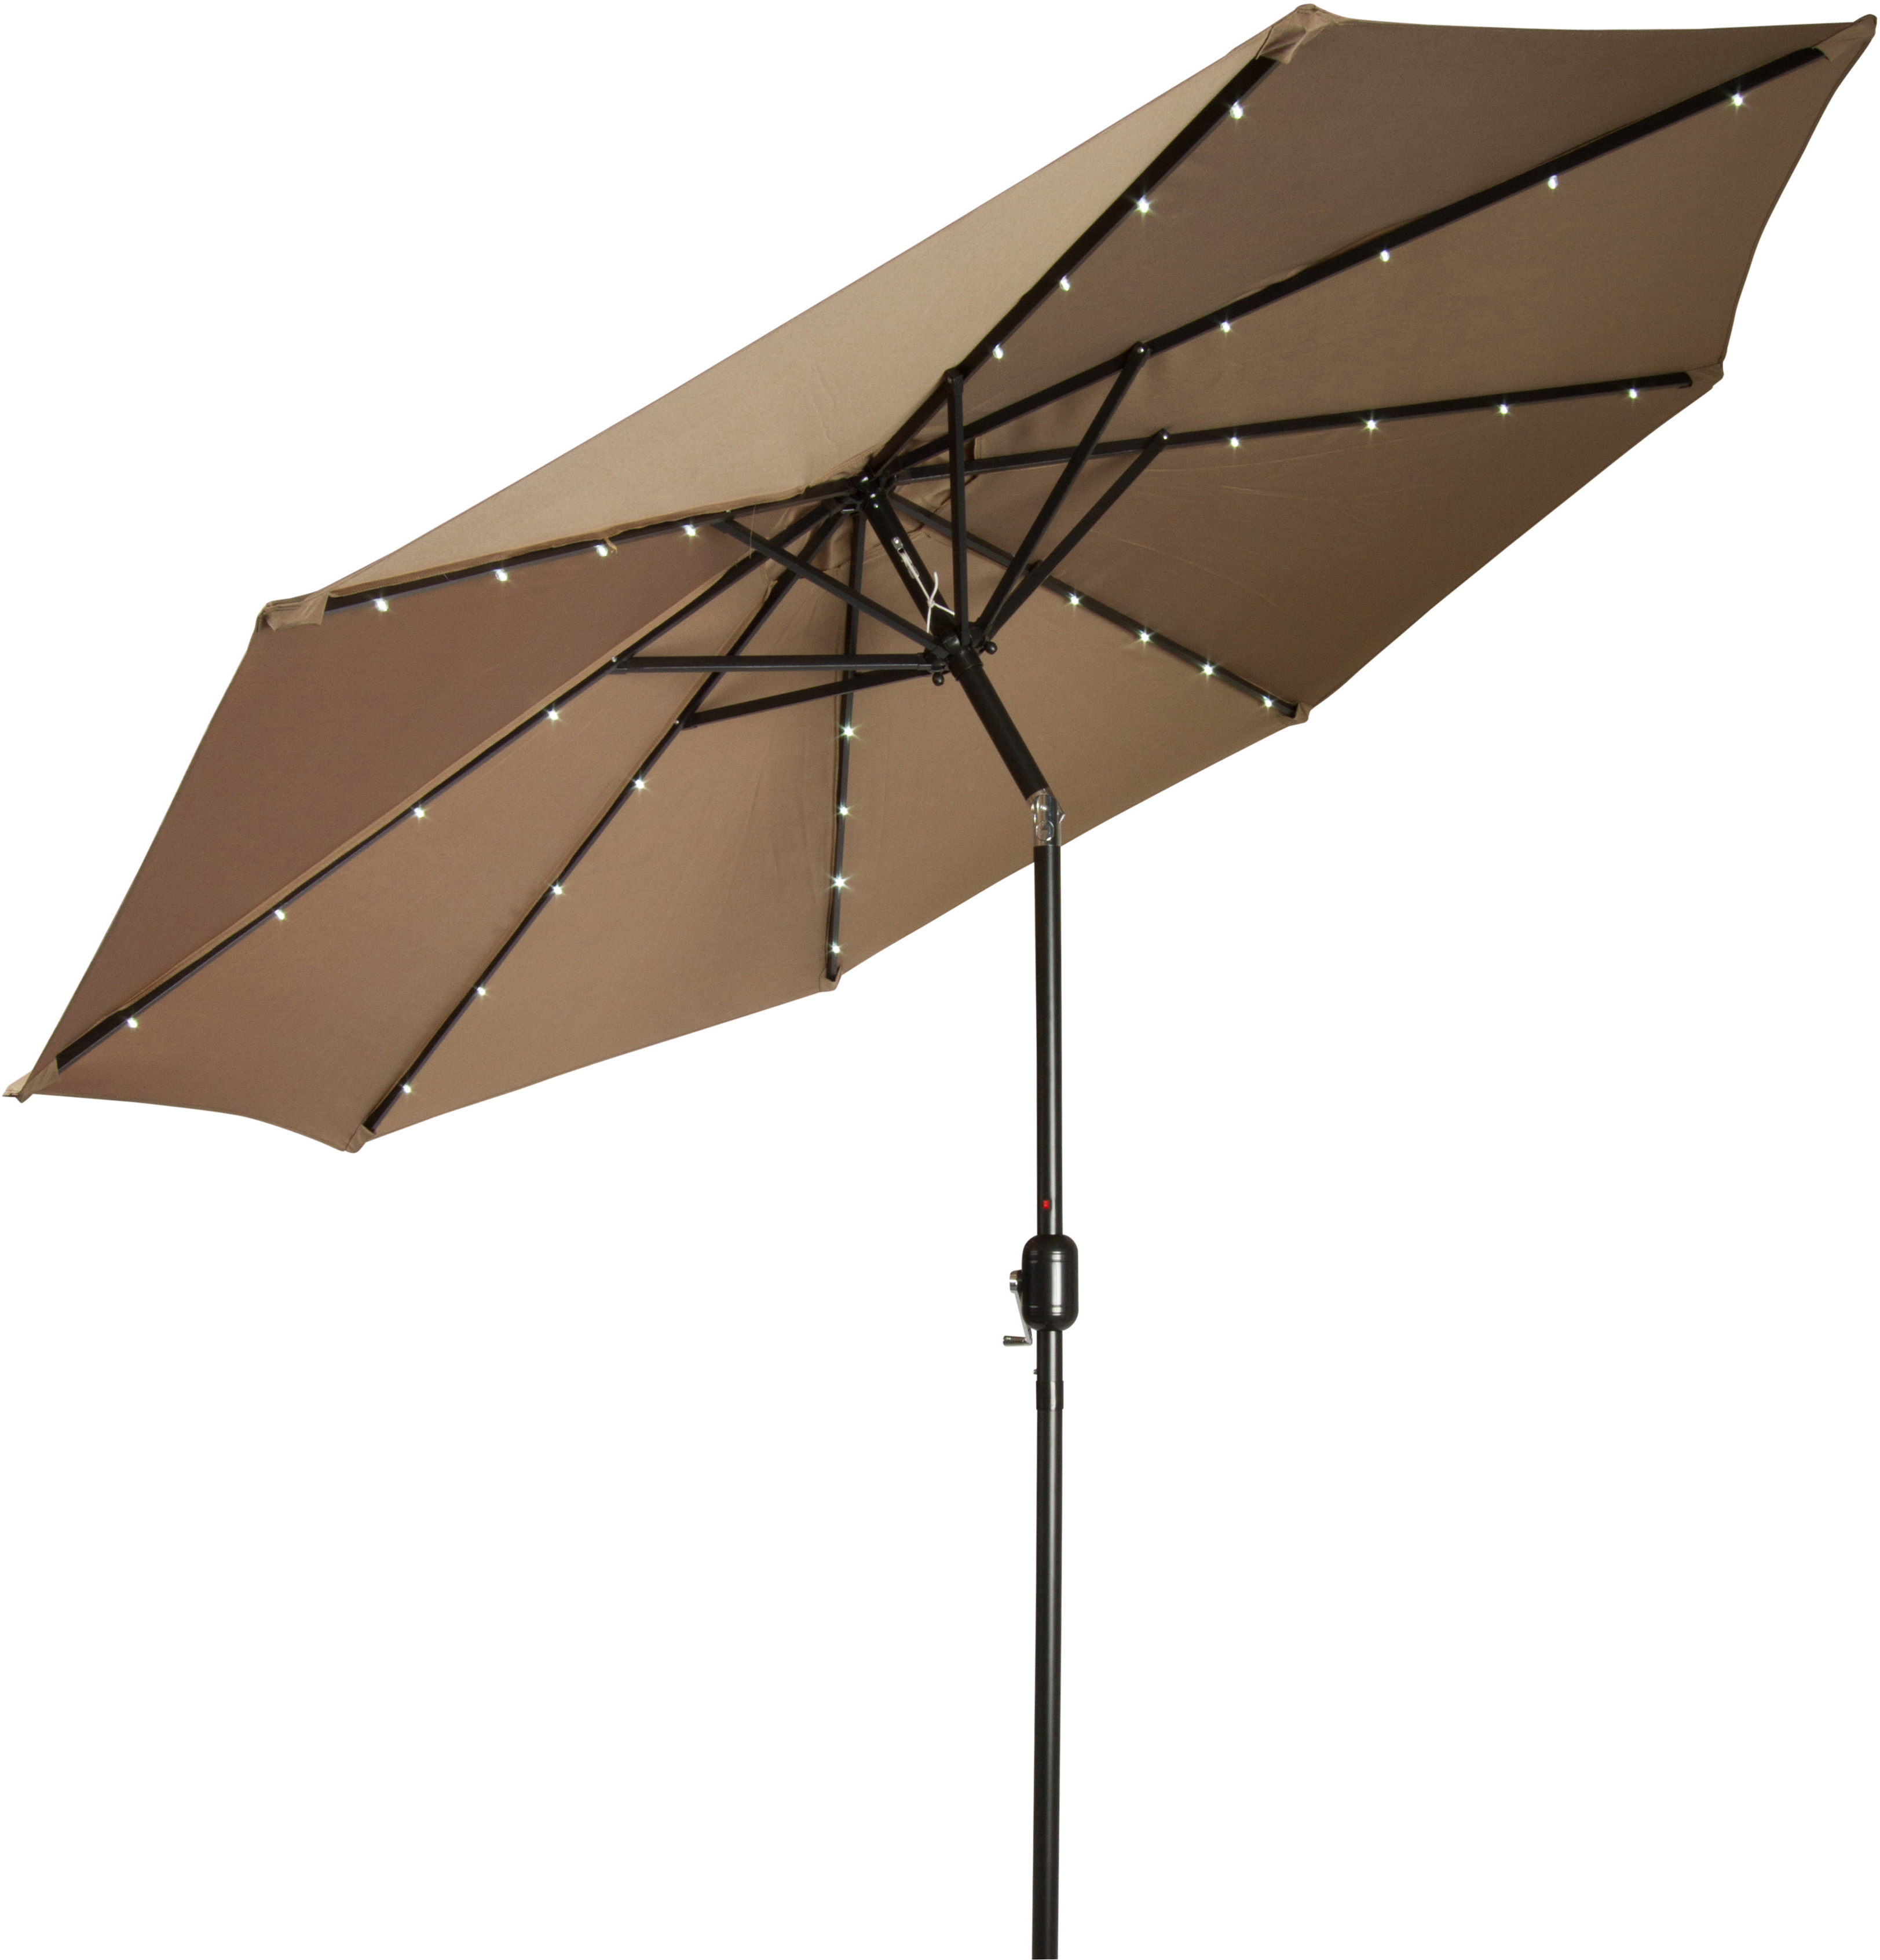 2020 Woll 9' Lighted Market Umbrella Inside Winchester Zipcode Design Market Umbrellas (Gallery 13 of 20)